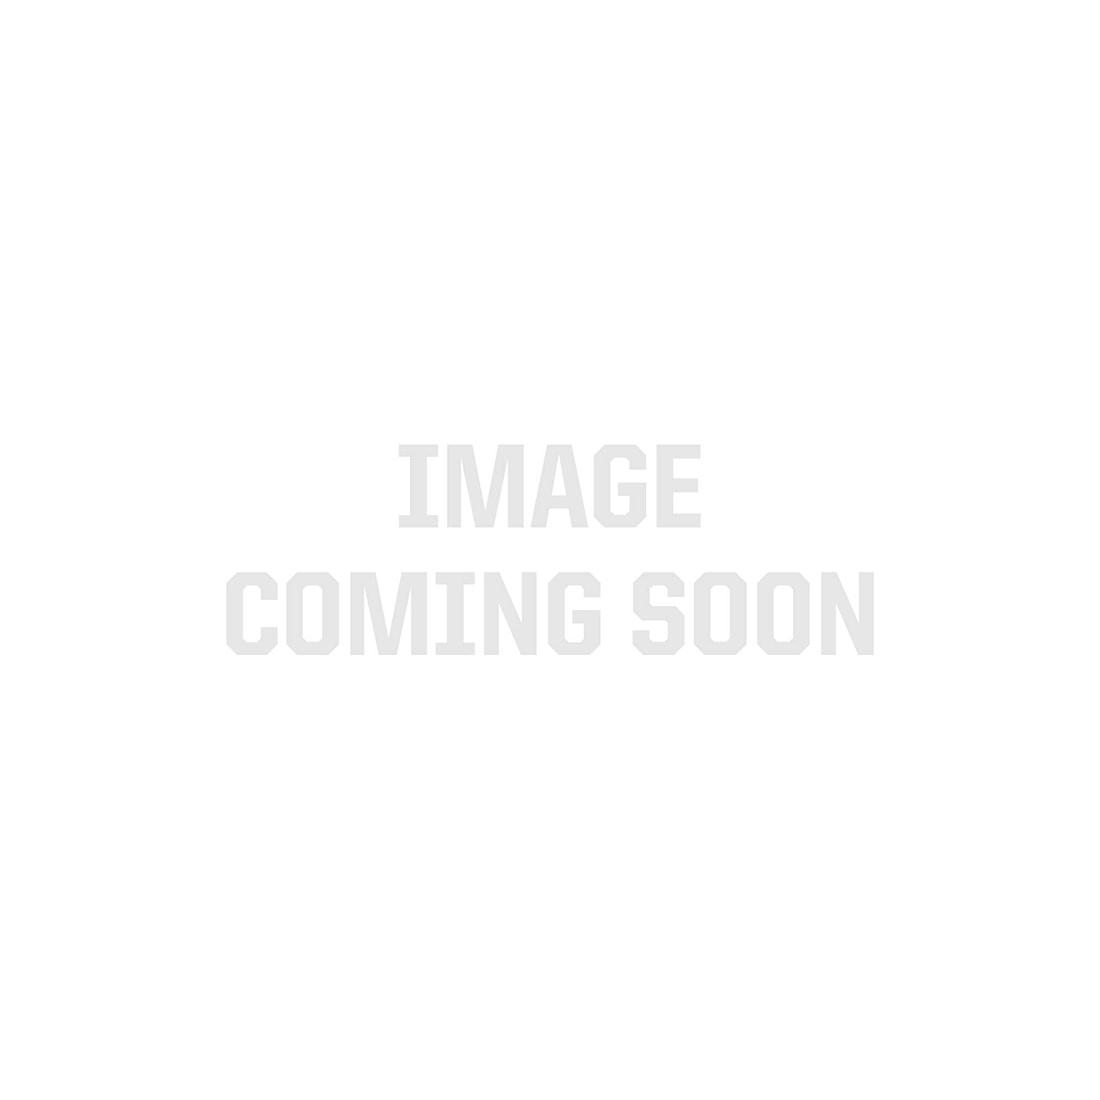 RGB 5050 Single Row CurrentControl LED Strip Light, 60/m, 12mm wide, Sample Kit